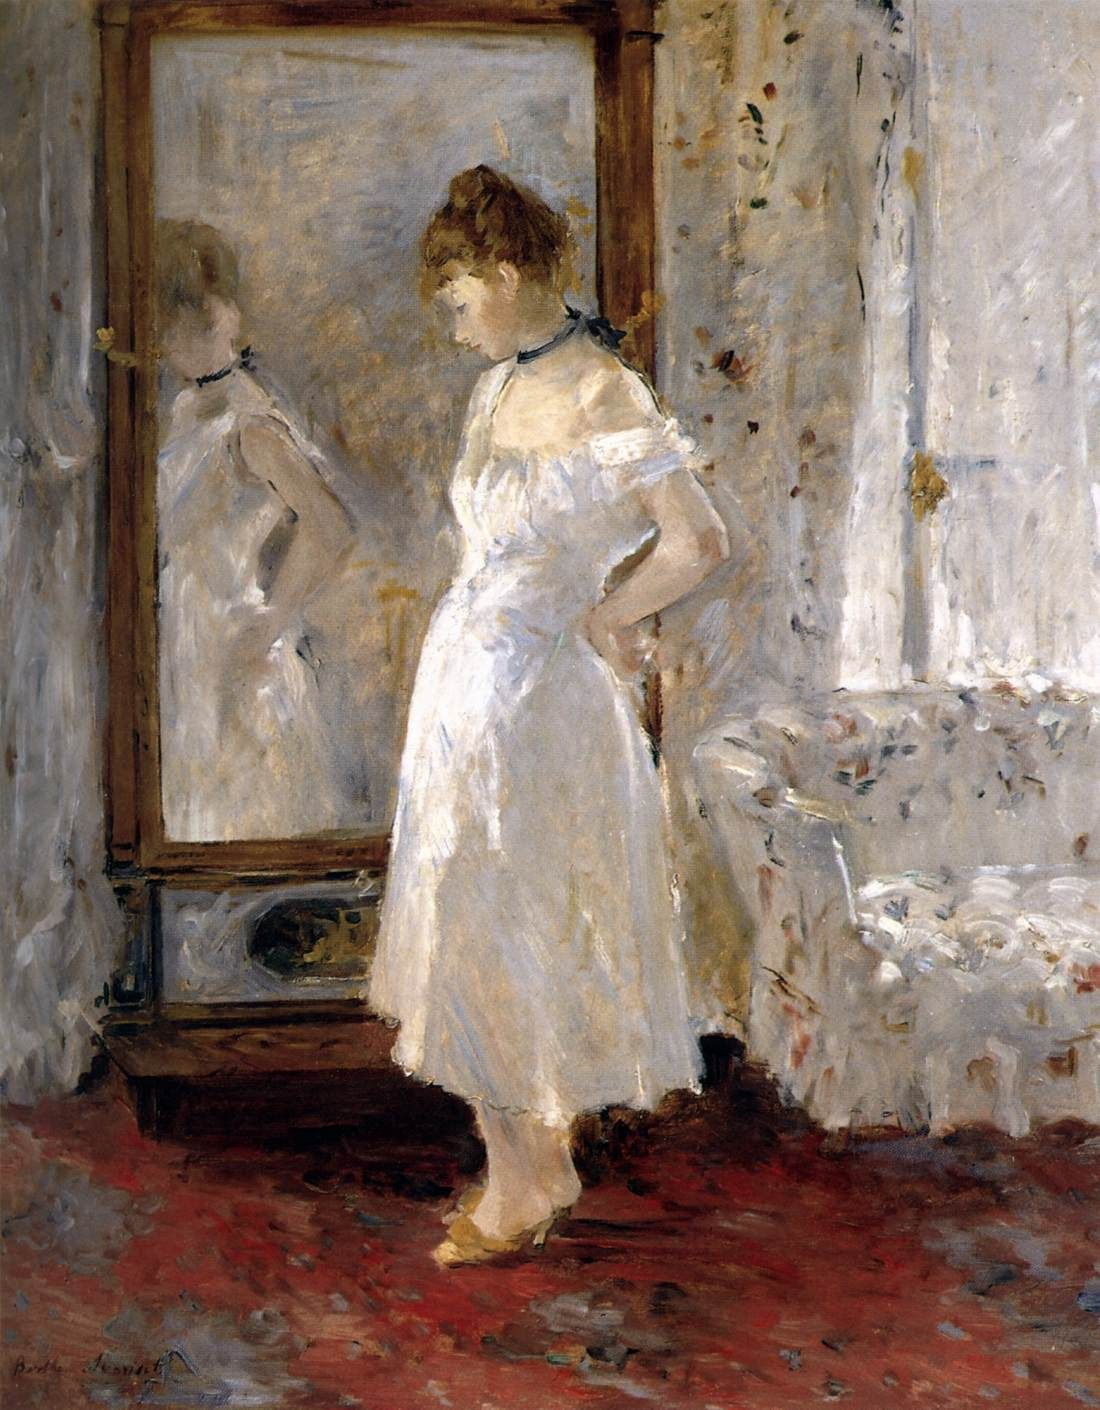 Berthe Morisot, The Cheval-Glass, 1877-79, Oil on canvas, 65 x 54 cm, Museo Thyssen-Bornemisza, Madrid